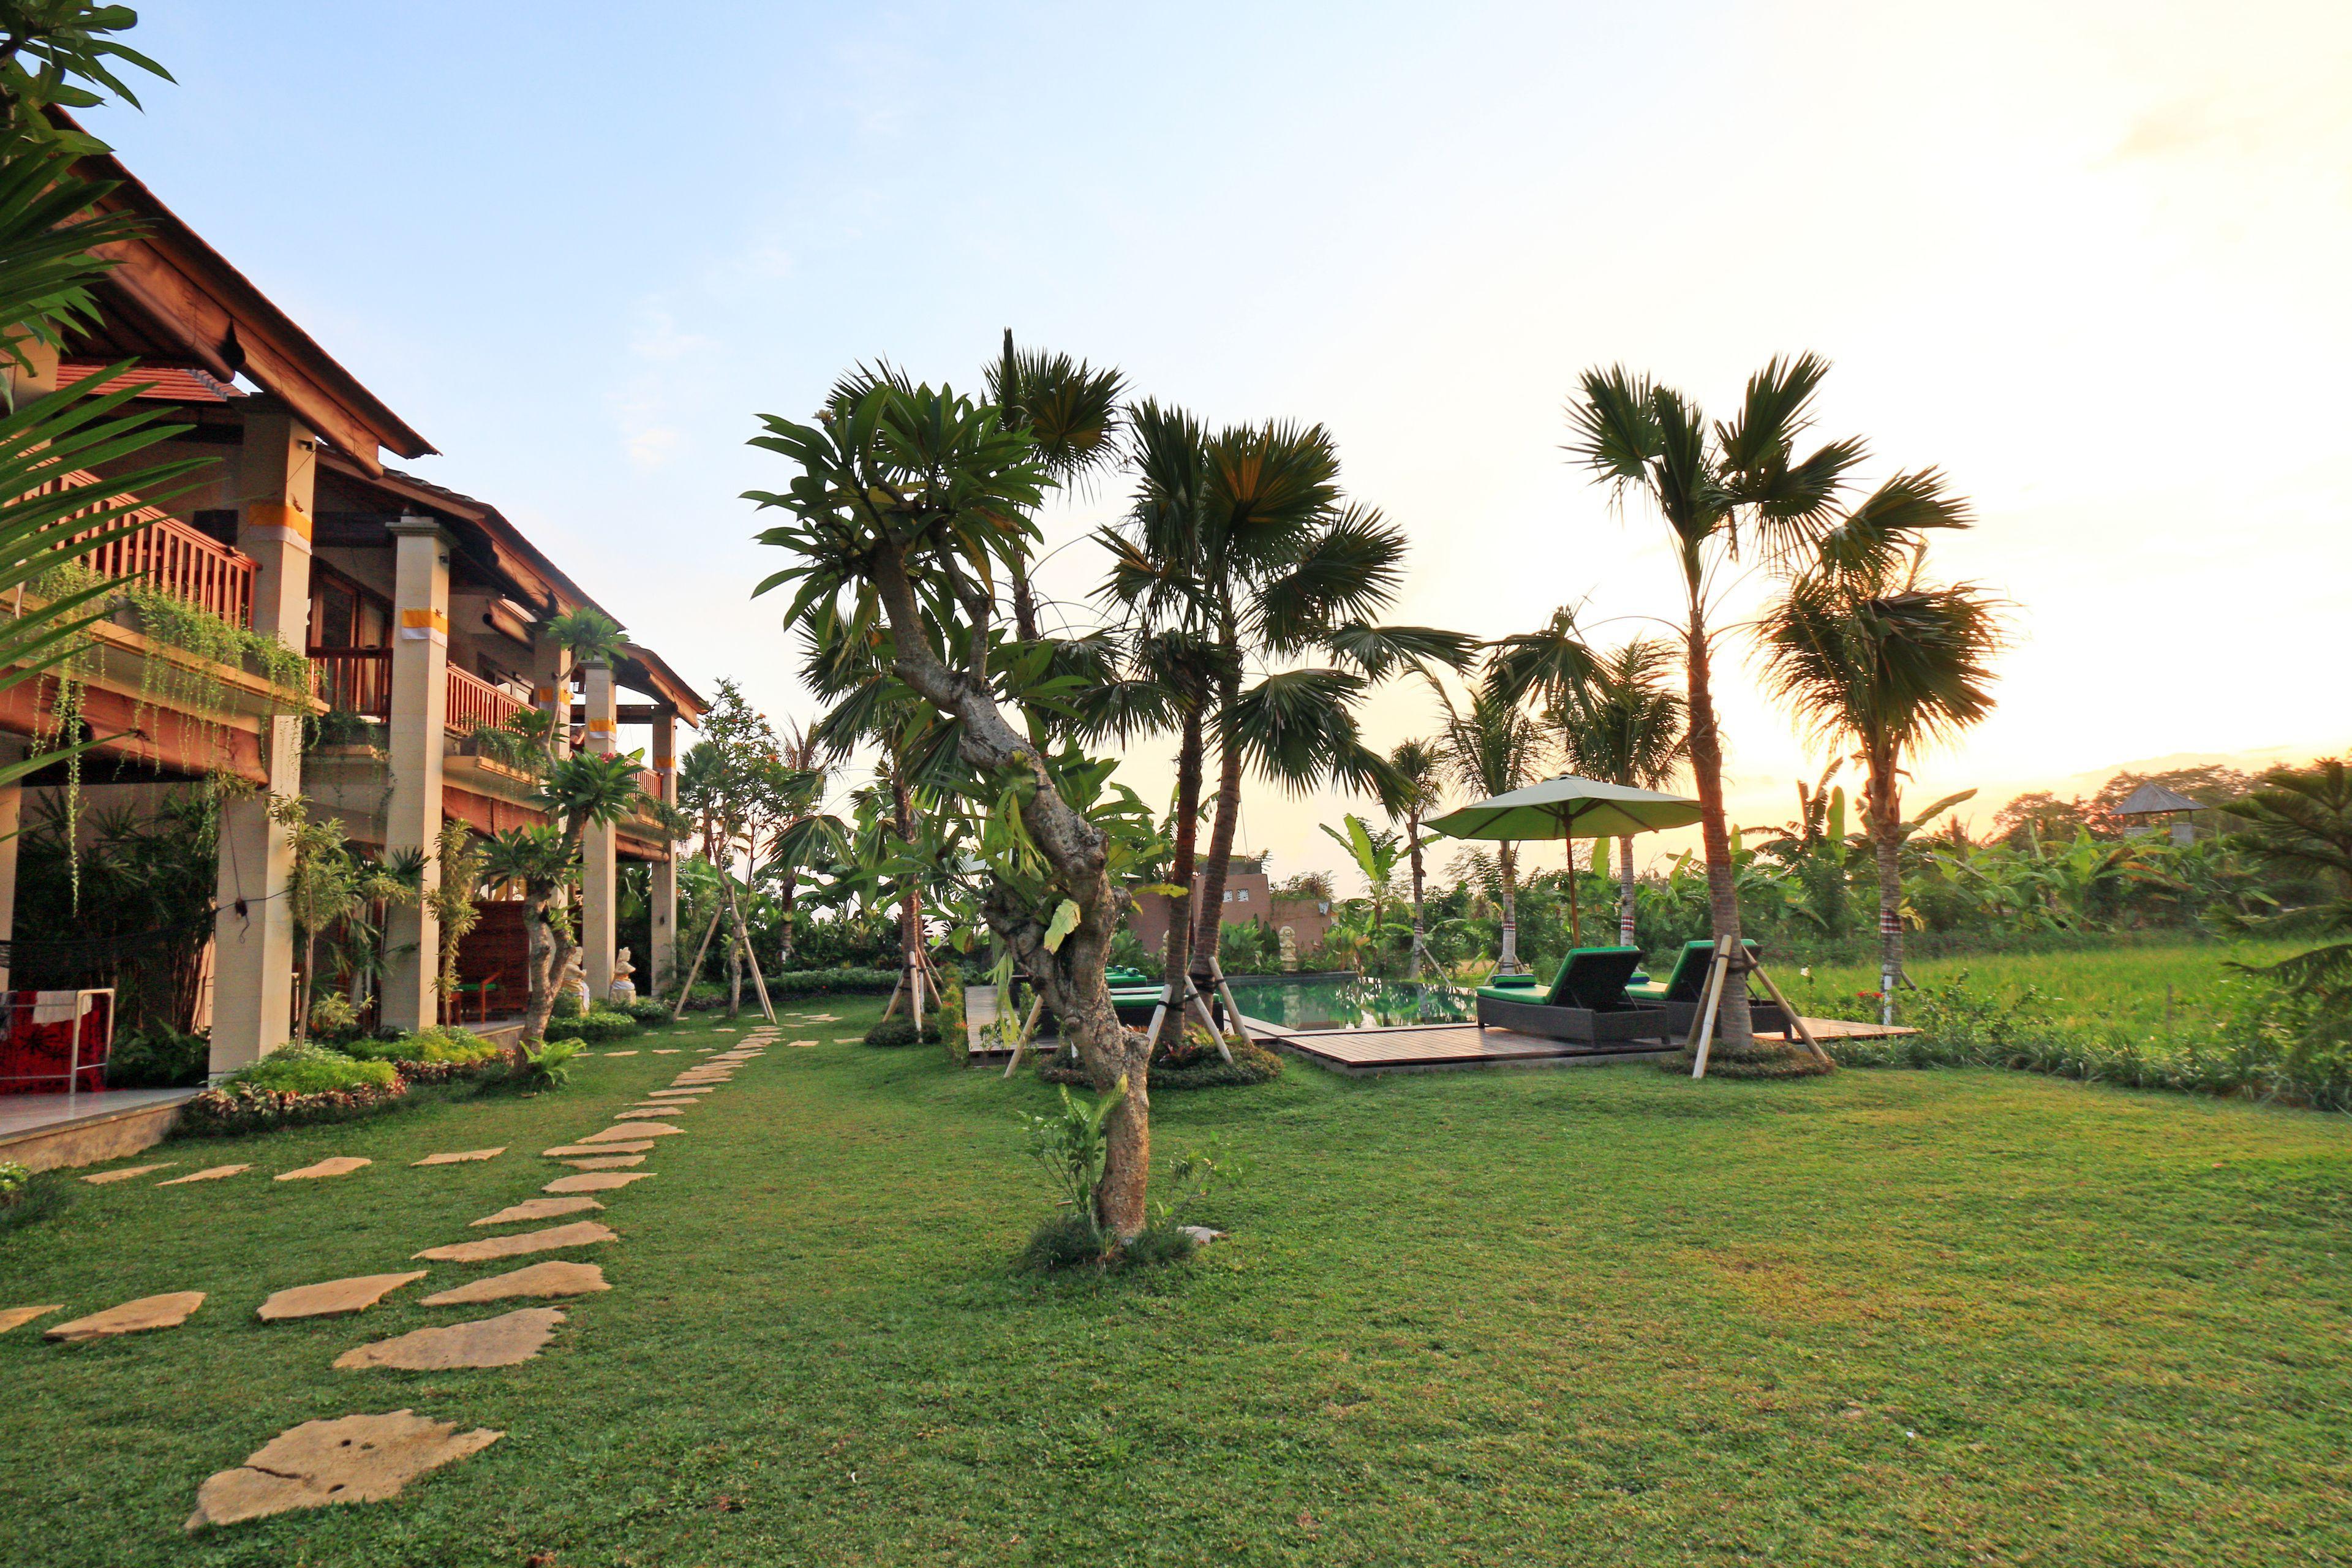 Courtesy of Ubud Tropical Garden / Expedia